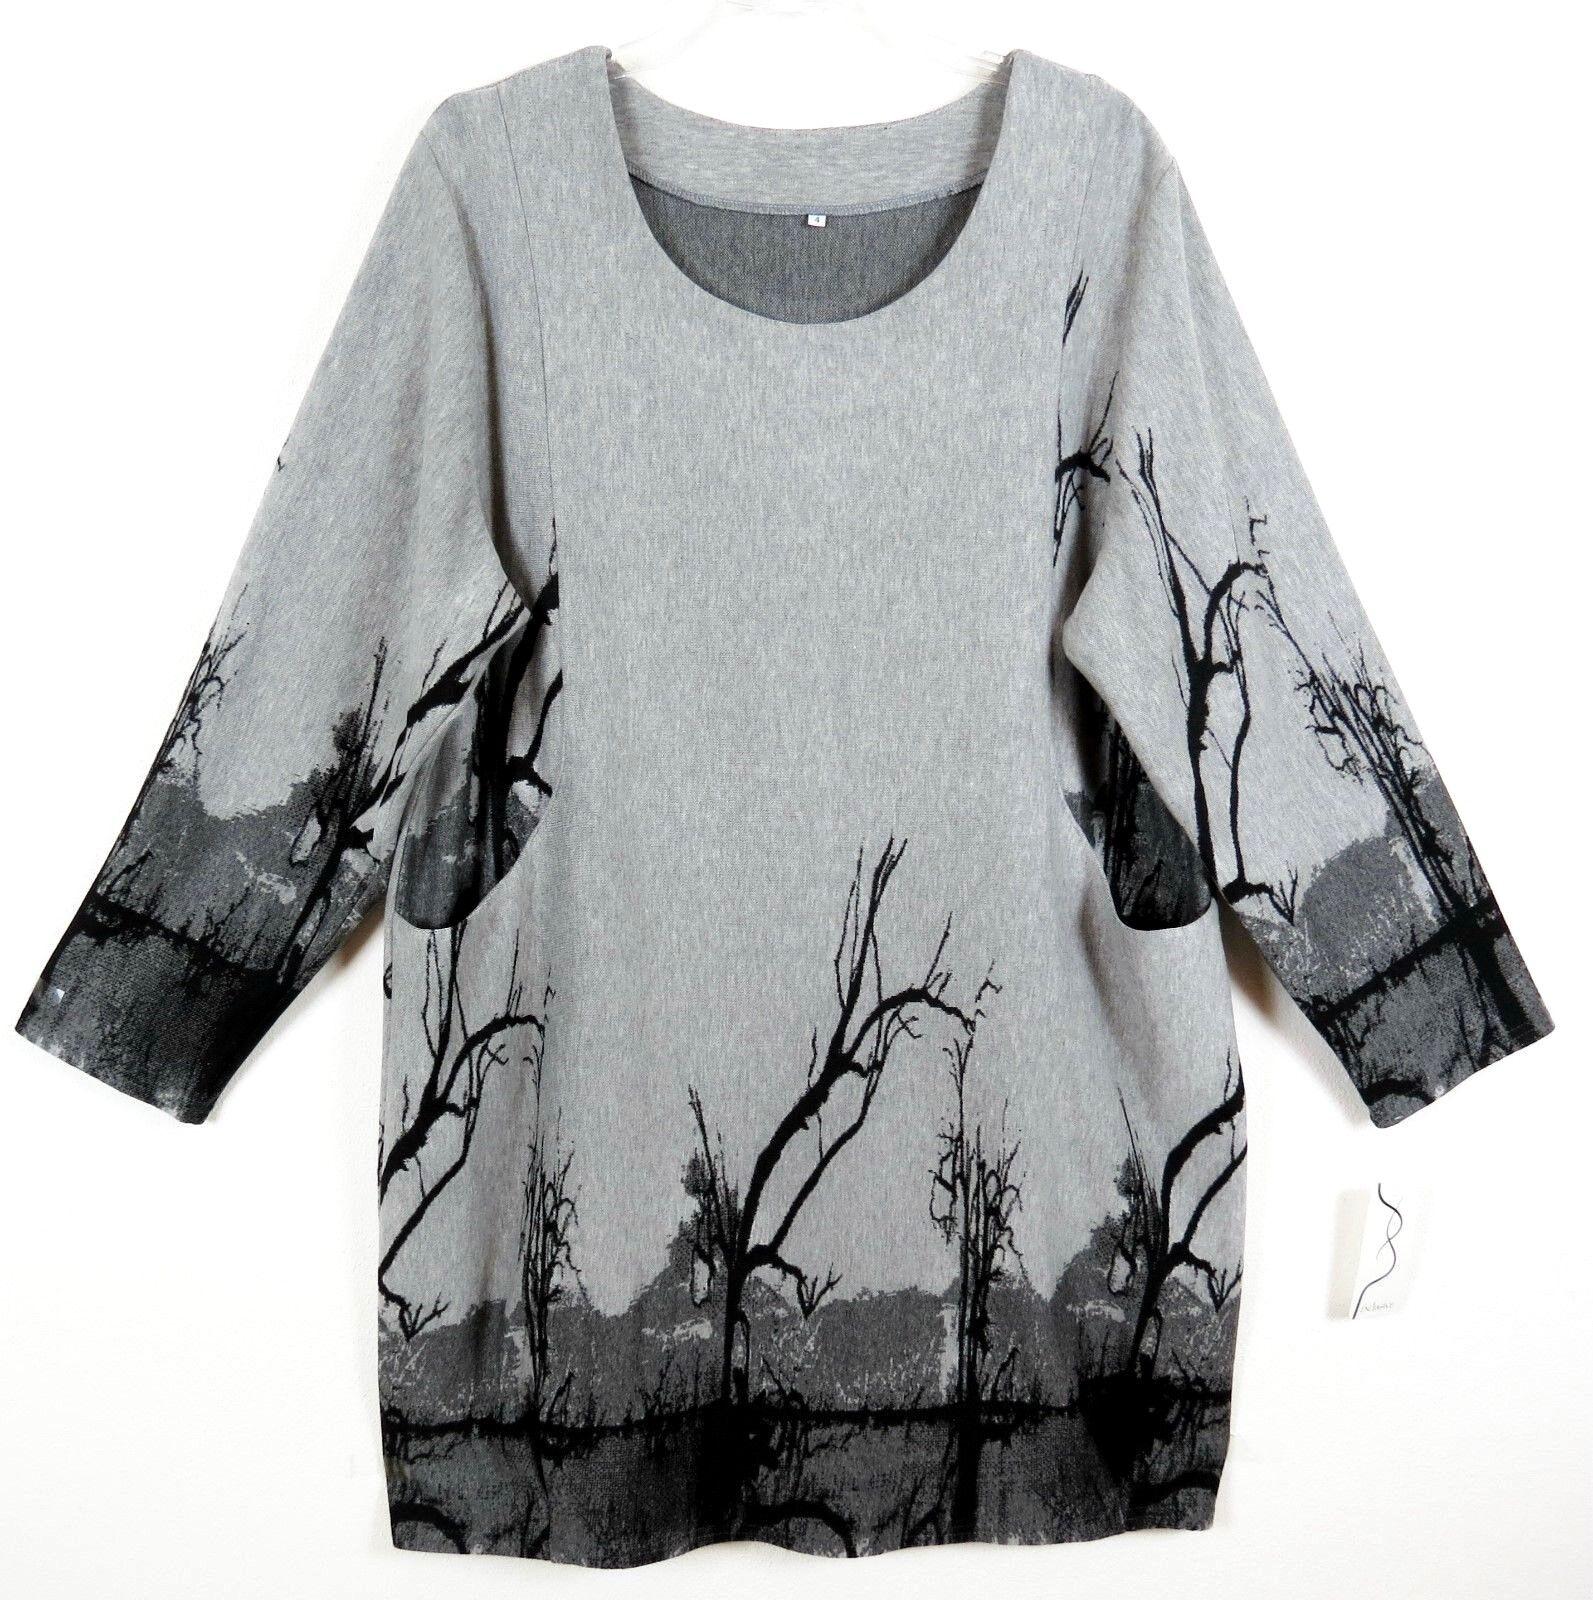 NEU traumhaft Kleid Dress Robe Long Tunika Tunic XL 48 50 Lagenlook exclusive